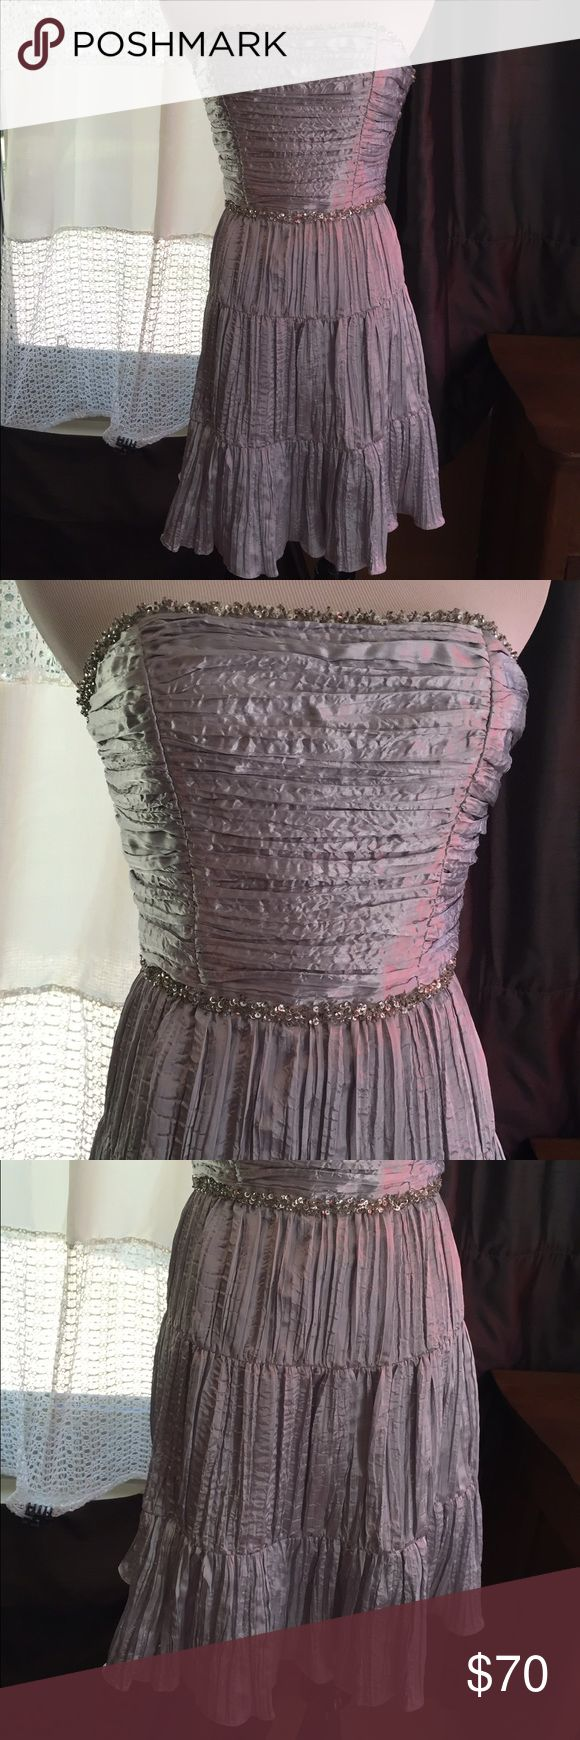 Short silver dress Short silver formal dress by Morgan & Co. So cute!! Morgan & Co Dresses Strapless